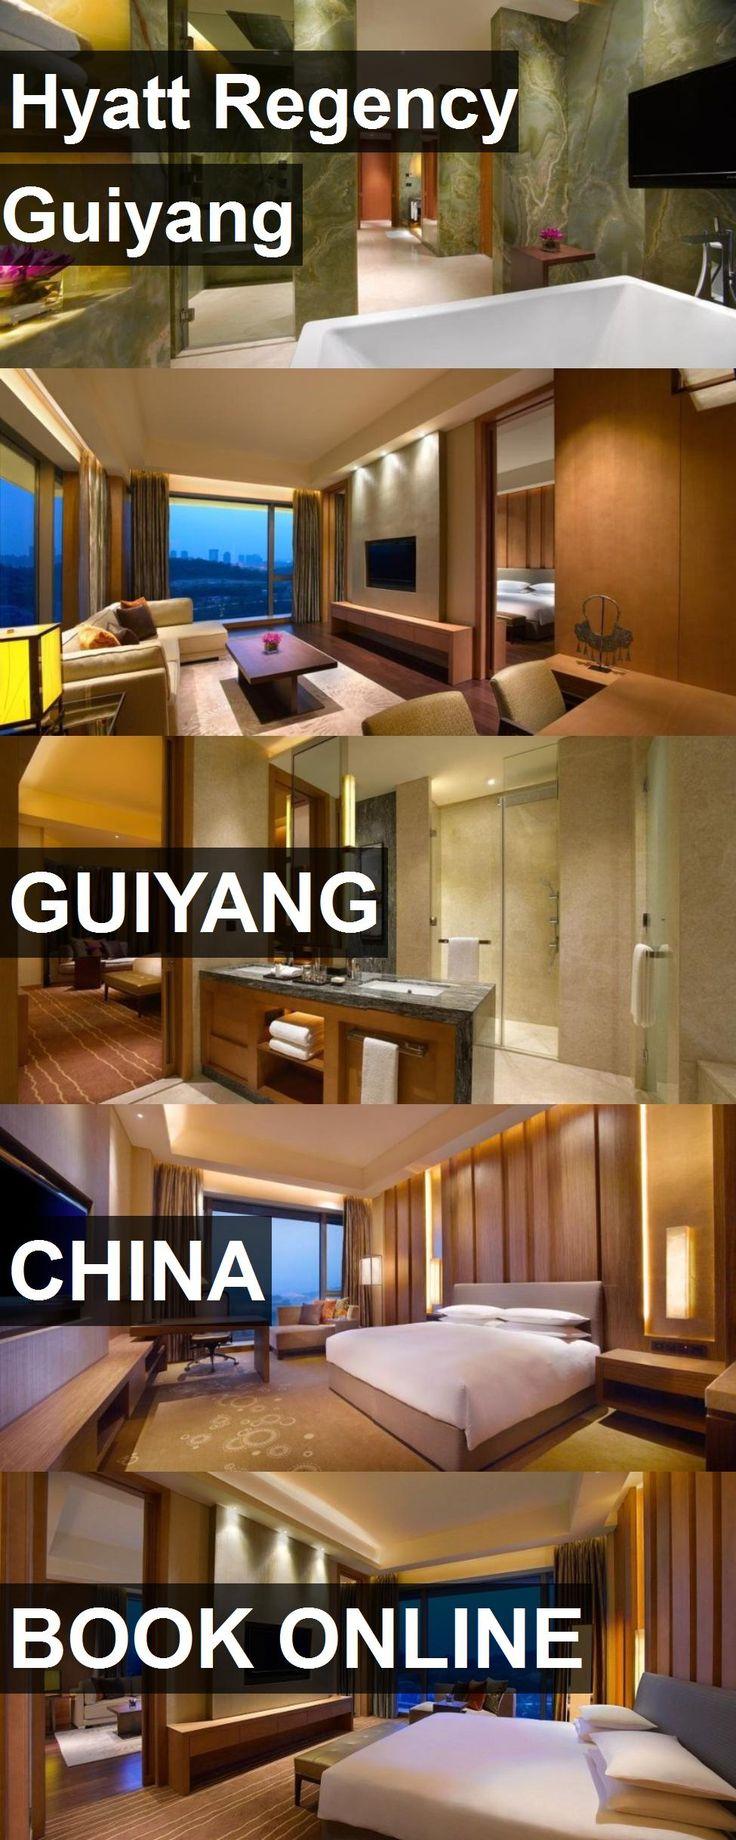 Hotel Hyatt Regency Guiyang in Guiyang, China. For more information, photos, reviews and best prices please follow the link. #China #Guiyang #travel #vacation #hotel